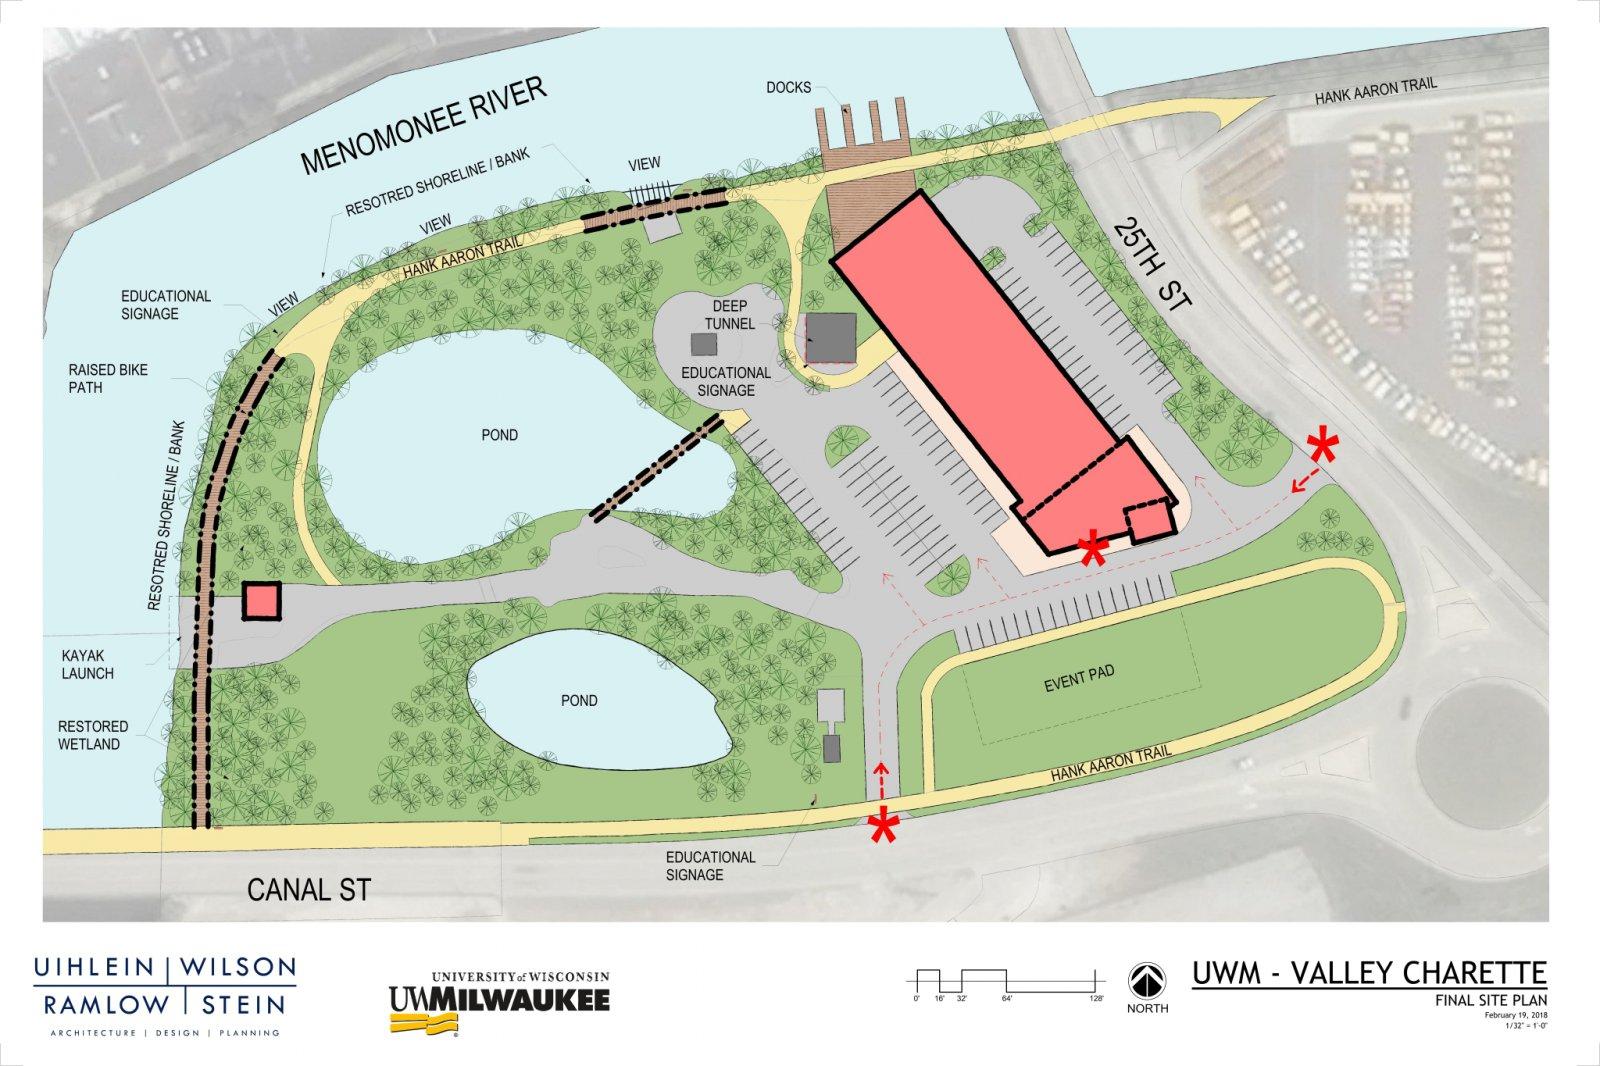 199 N. 25th St. Site Plan